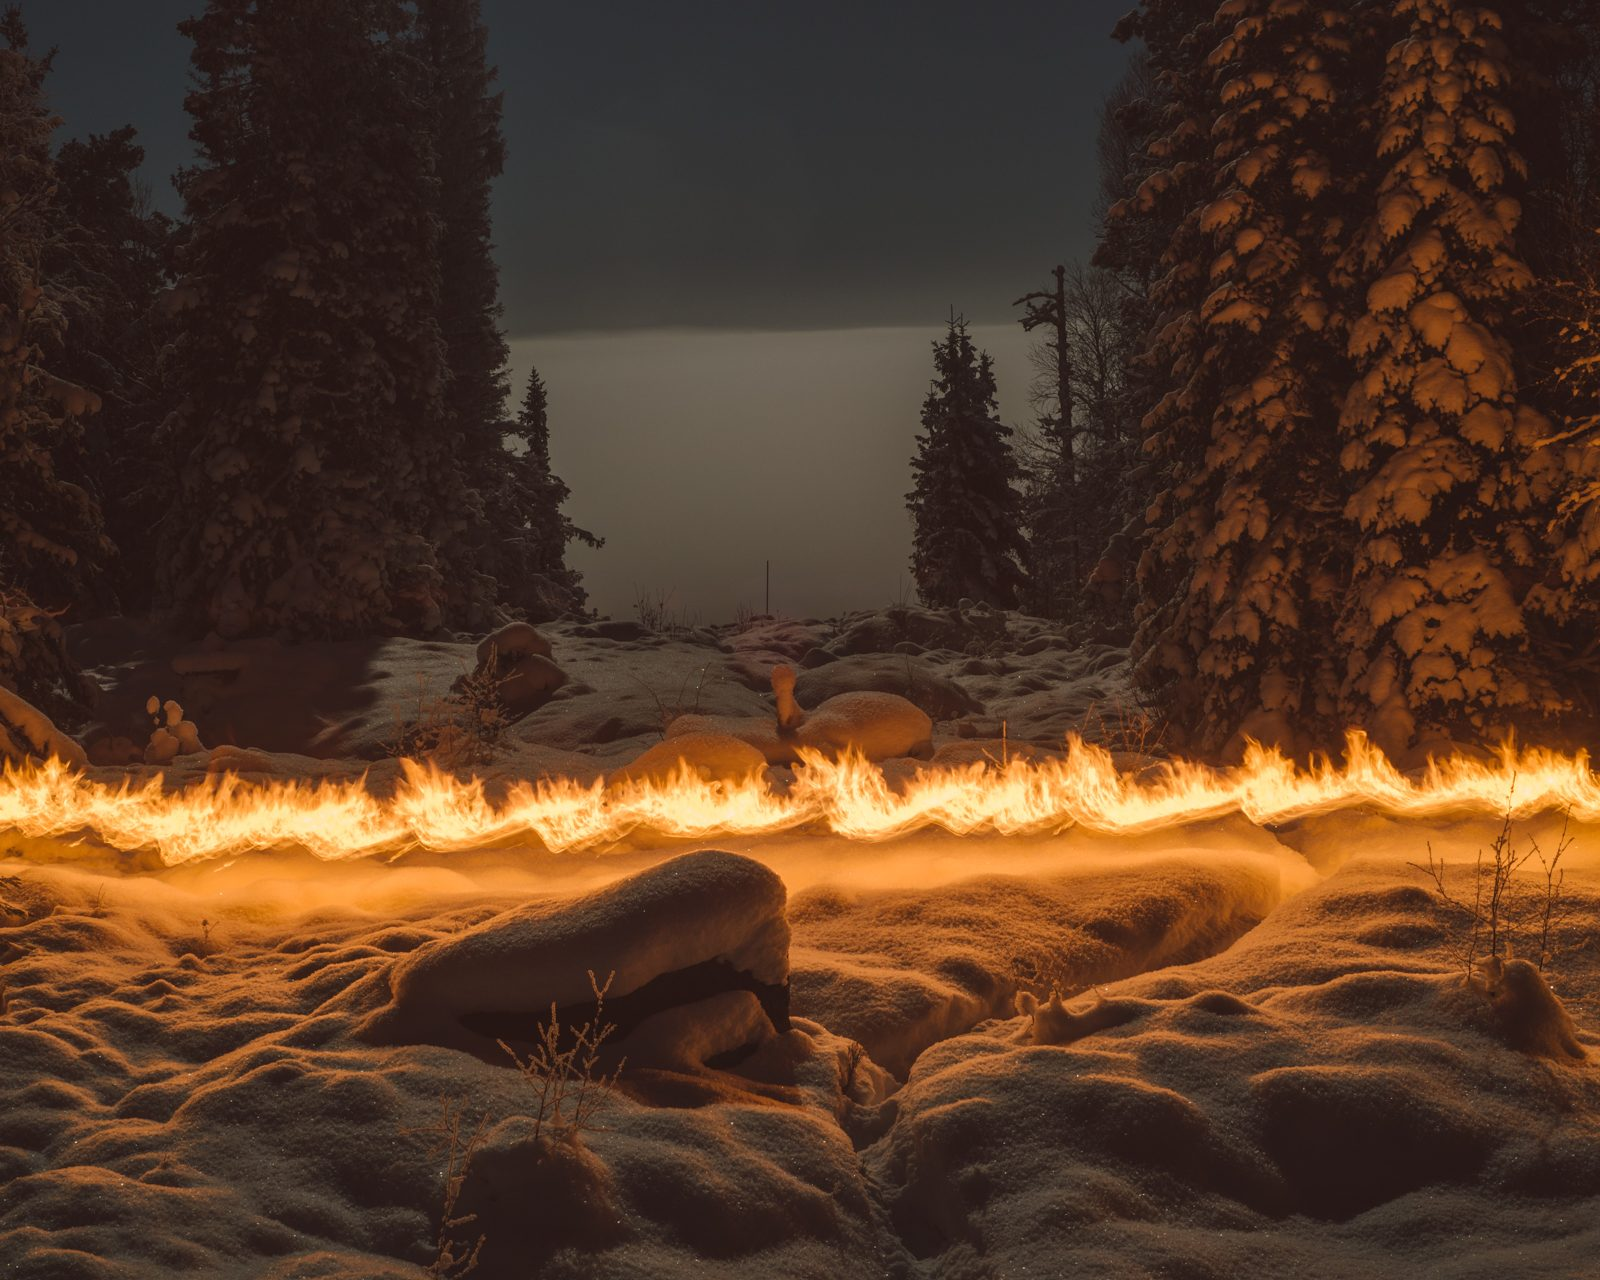 From Slash and Burn © Terje Abusdal